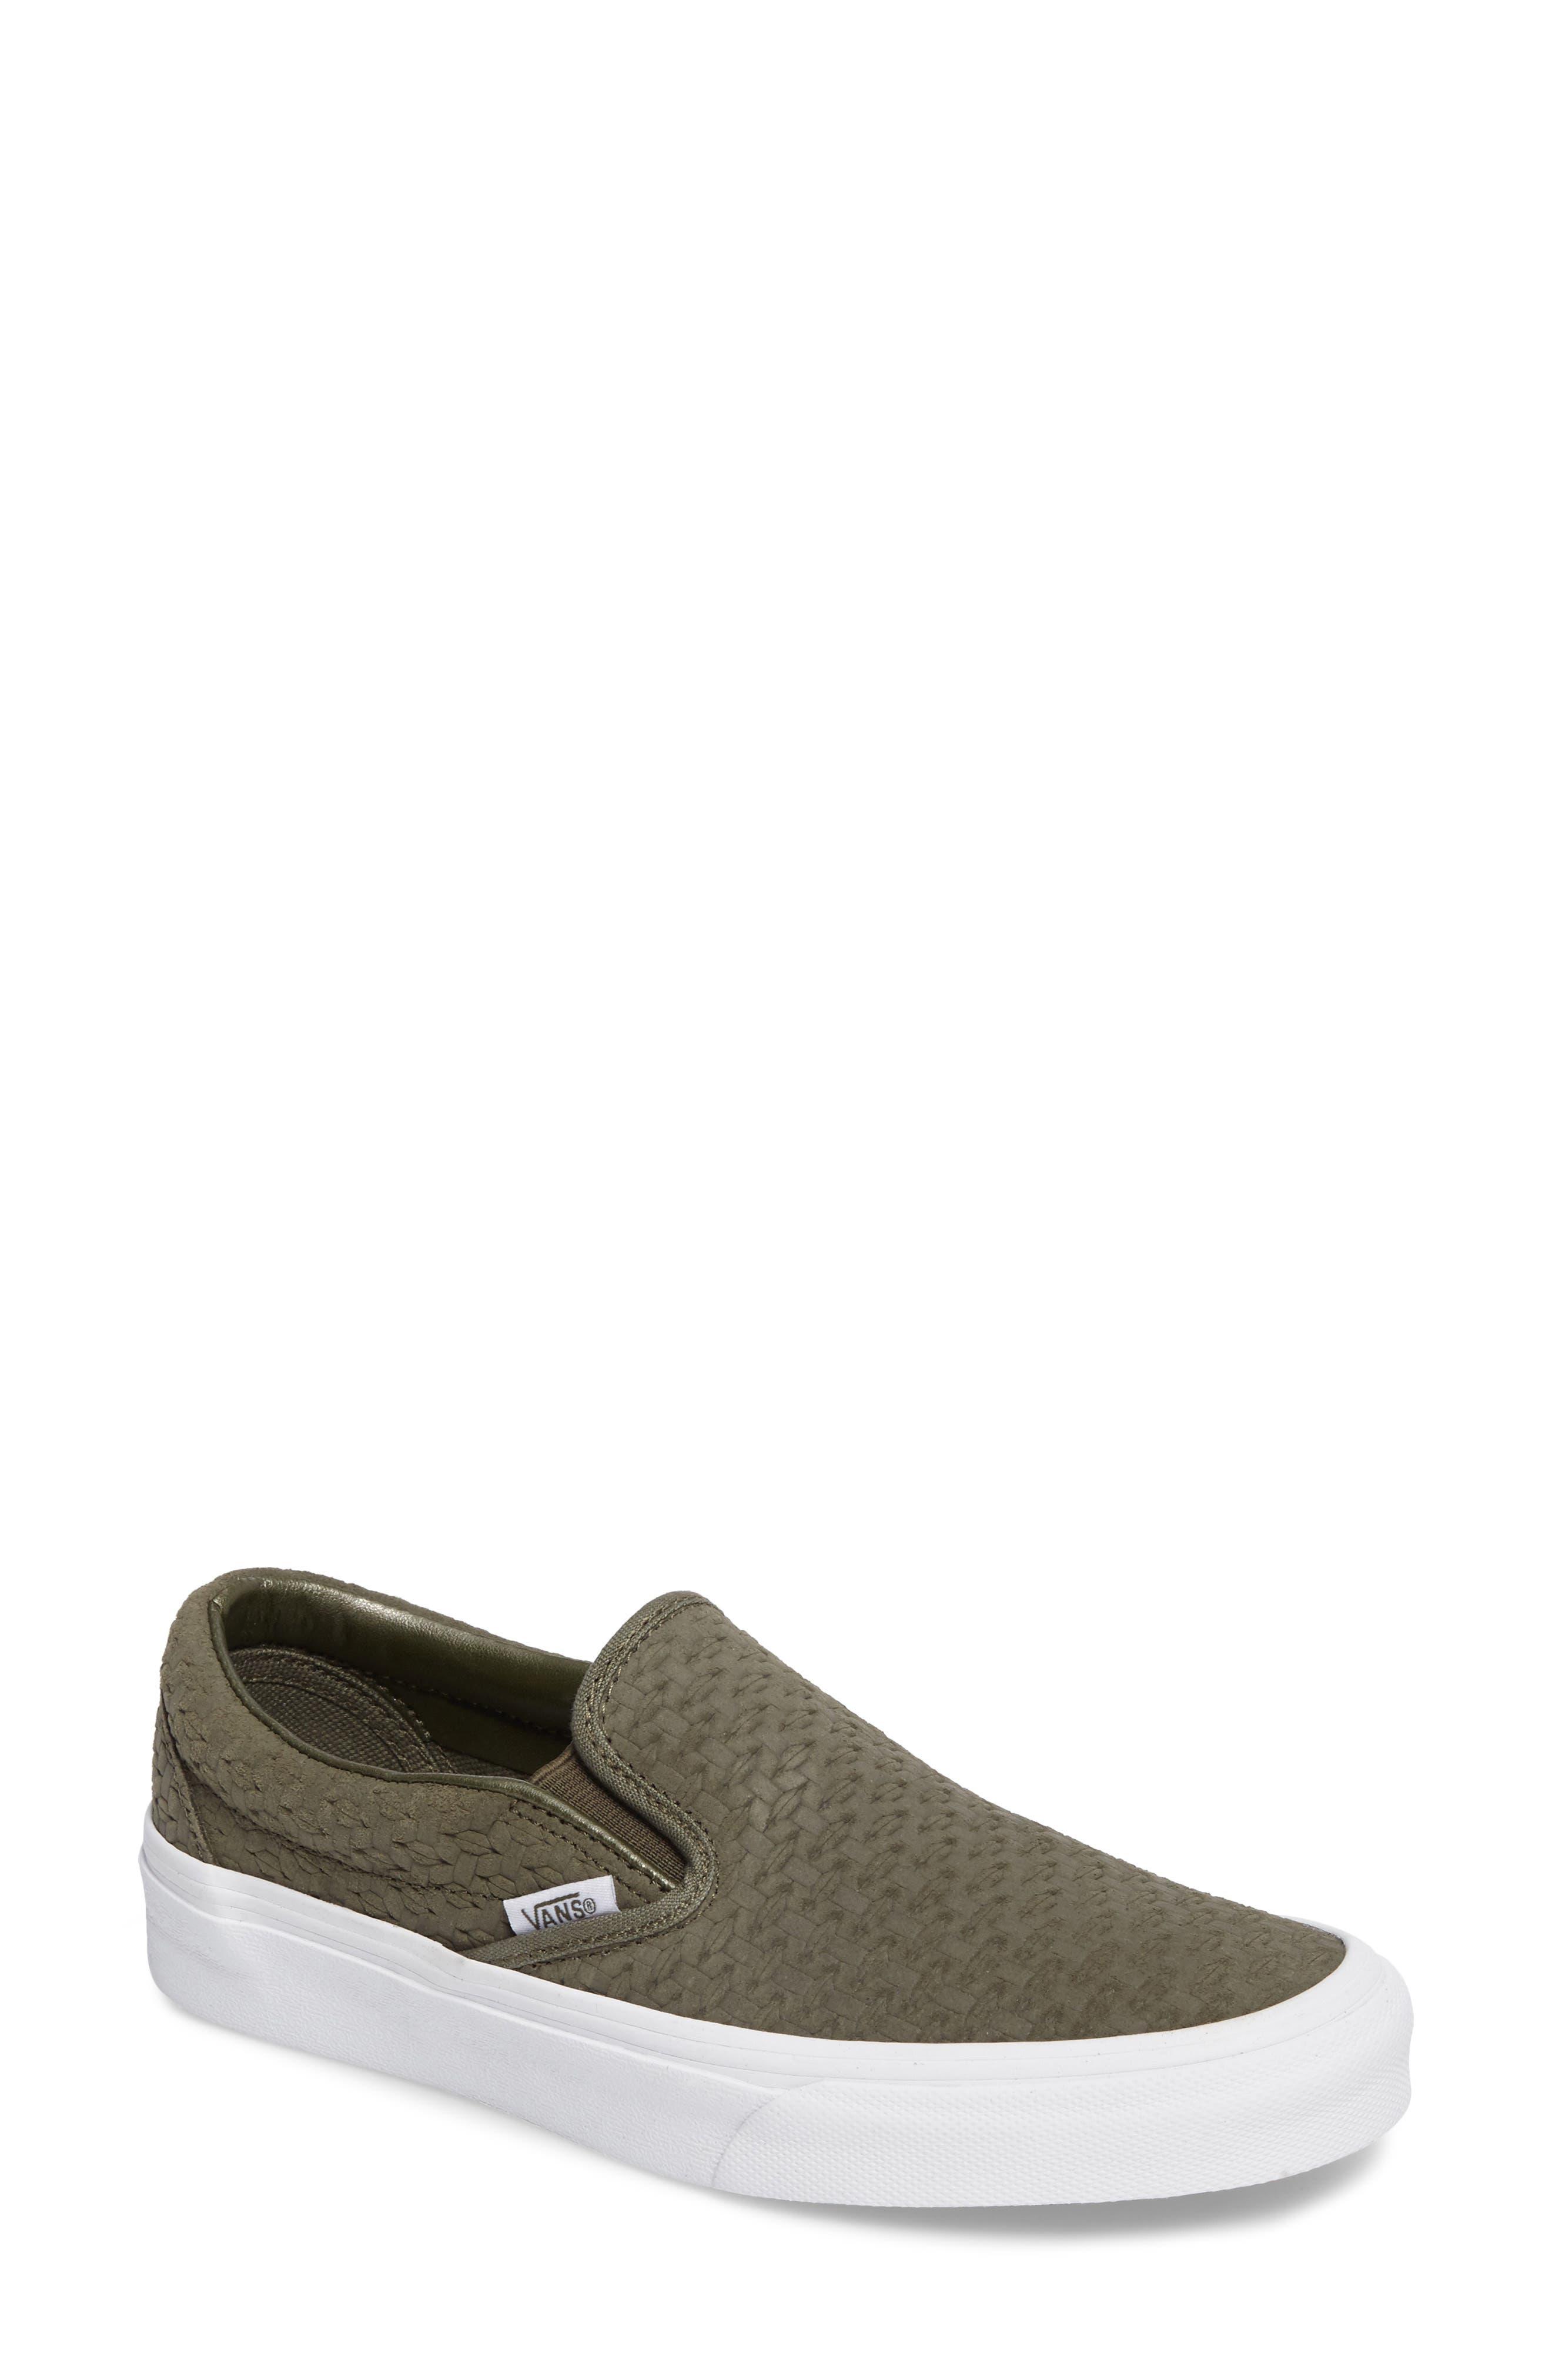 ,                             Classic Slip-On Sneaker,                             Main thumbnail 340, color,                             301